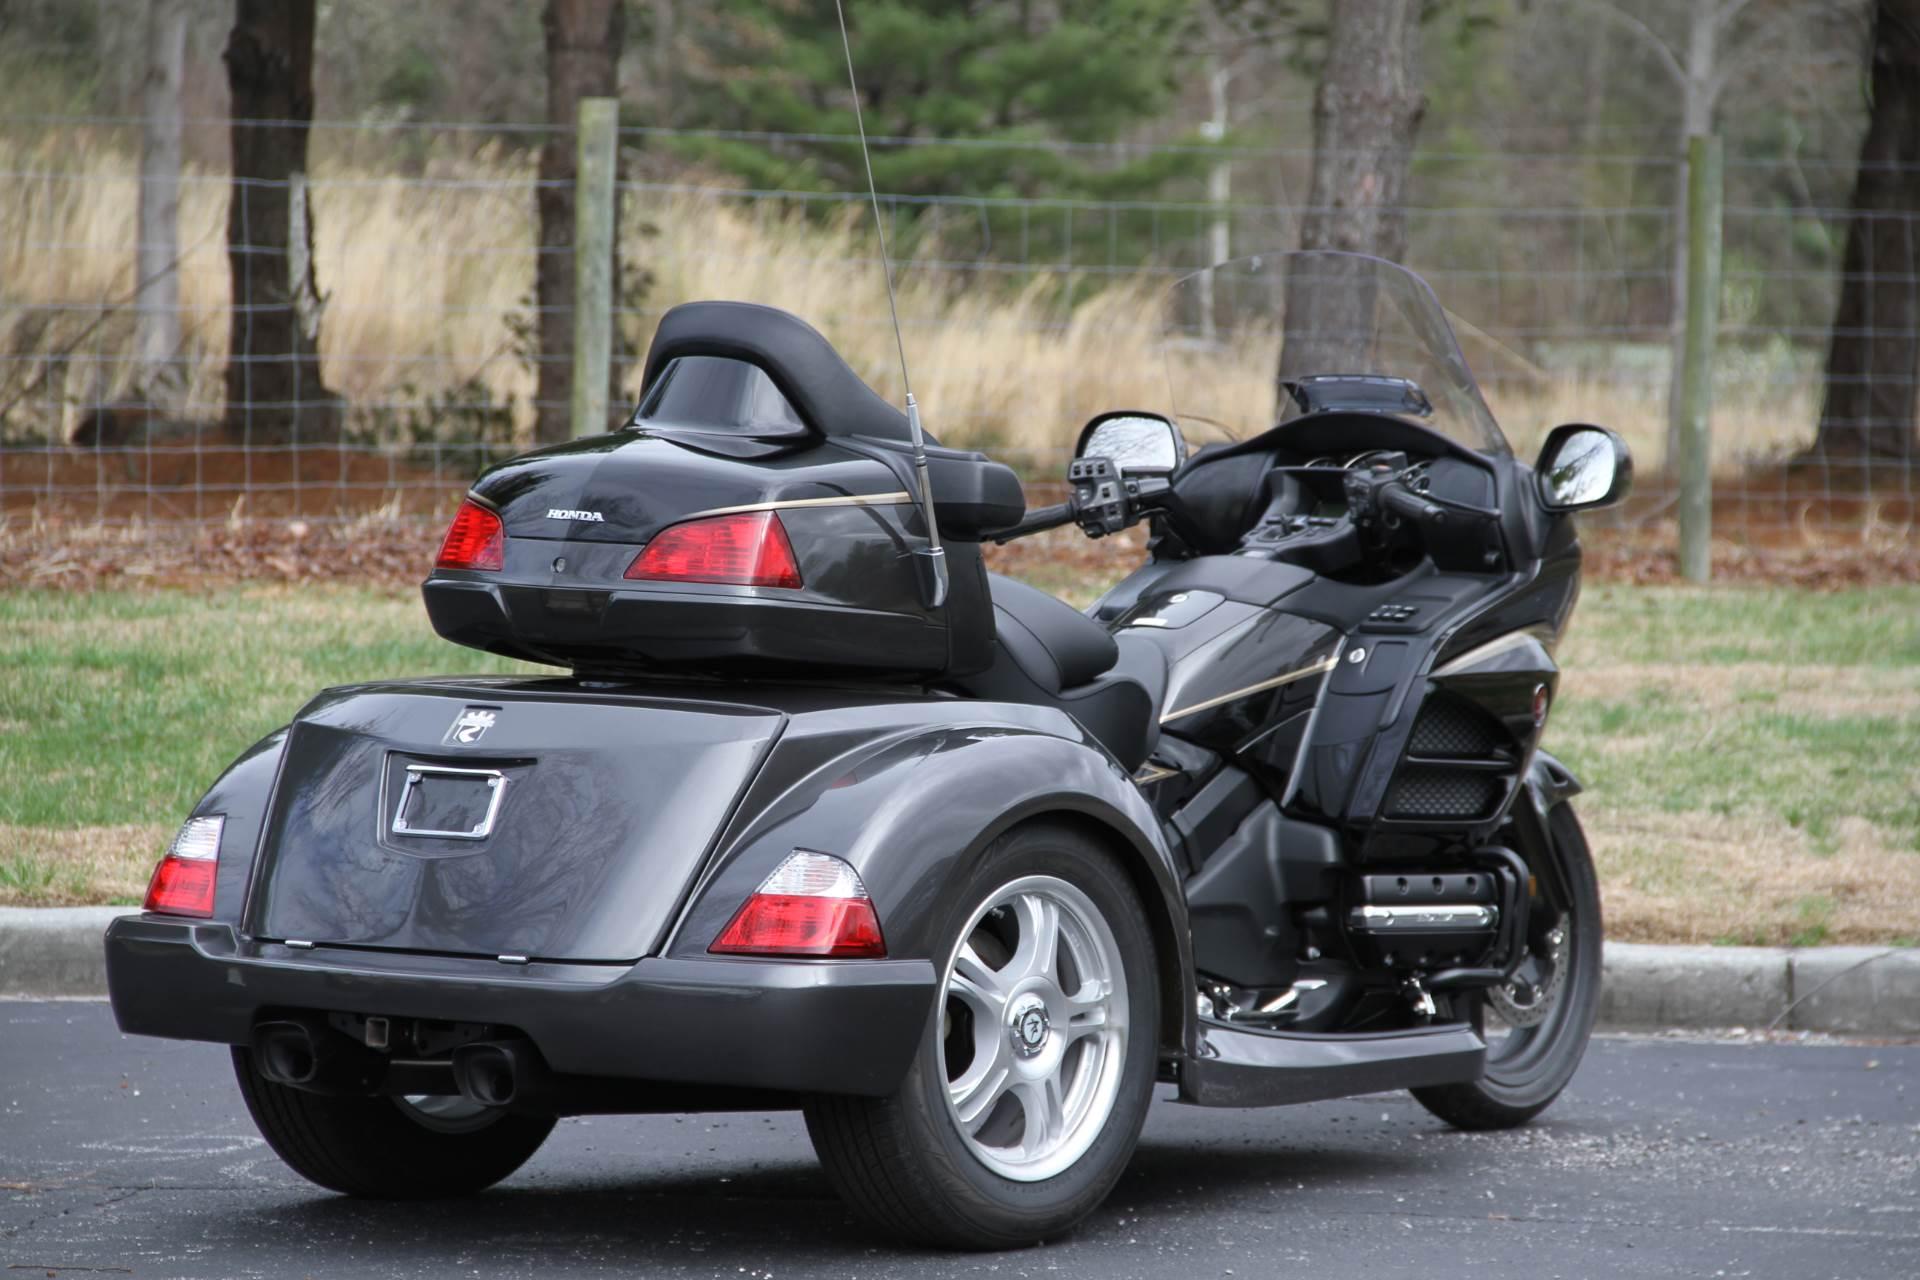 2016 Honda Goldwing In Hendersonville, North Carolina